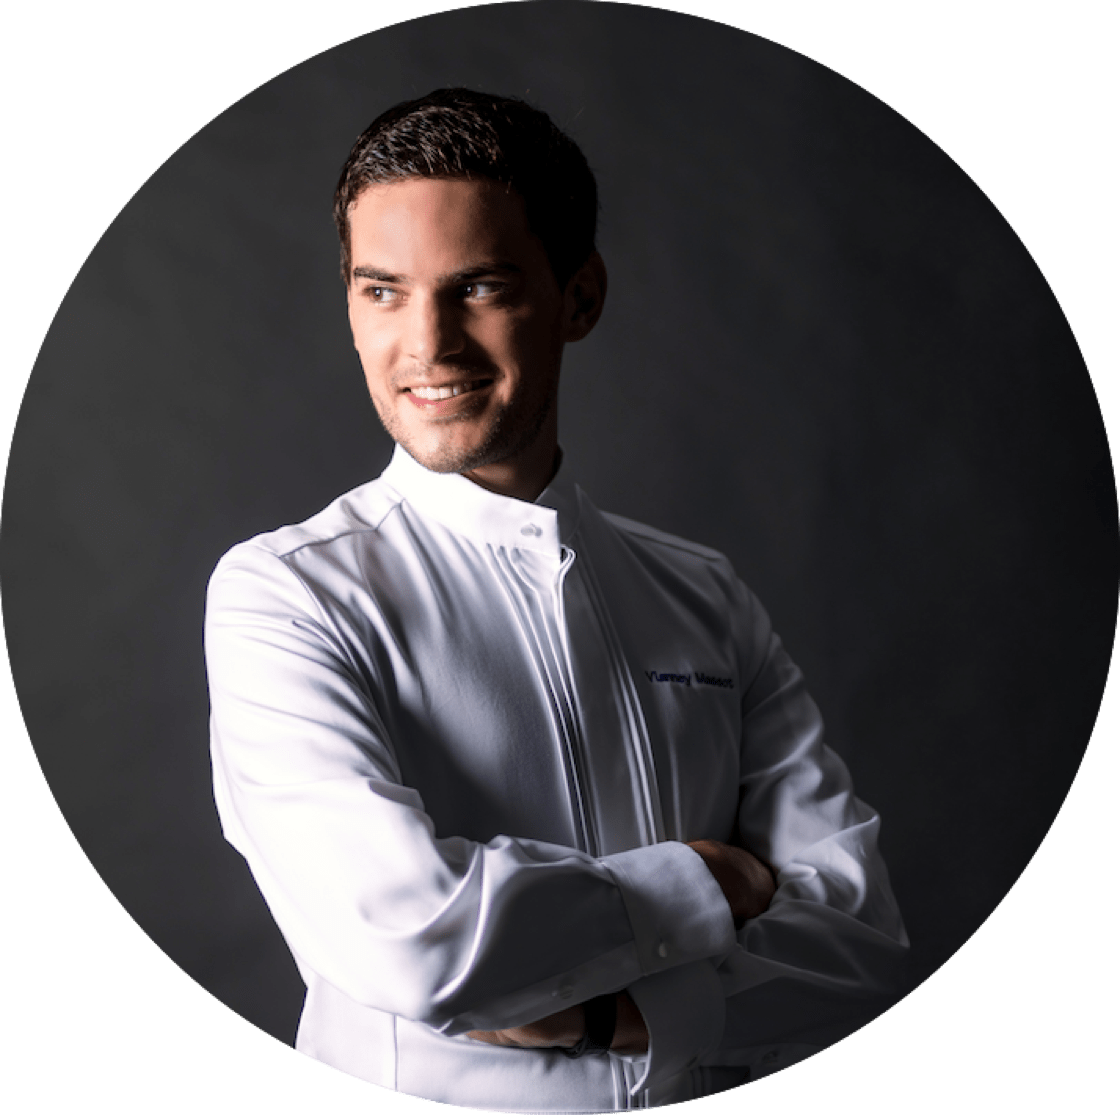 Executive Chef Vianney Massot of Vianney Massot Restaurant, 27.png